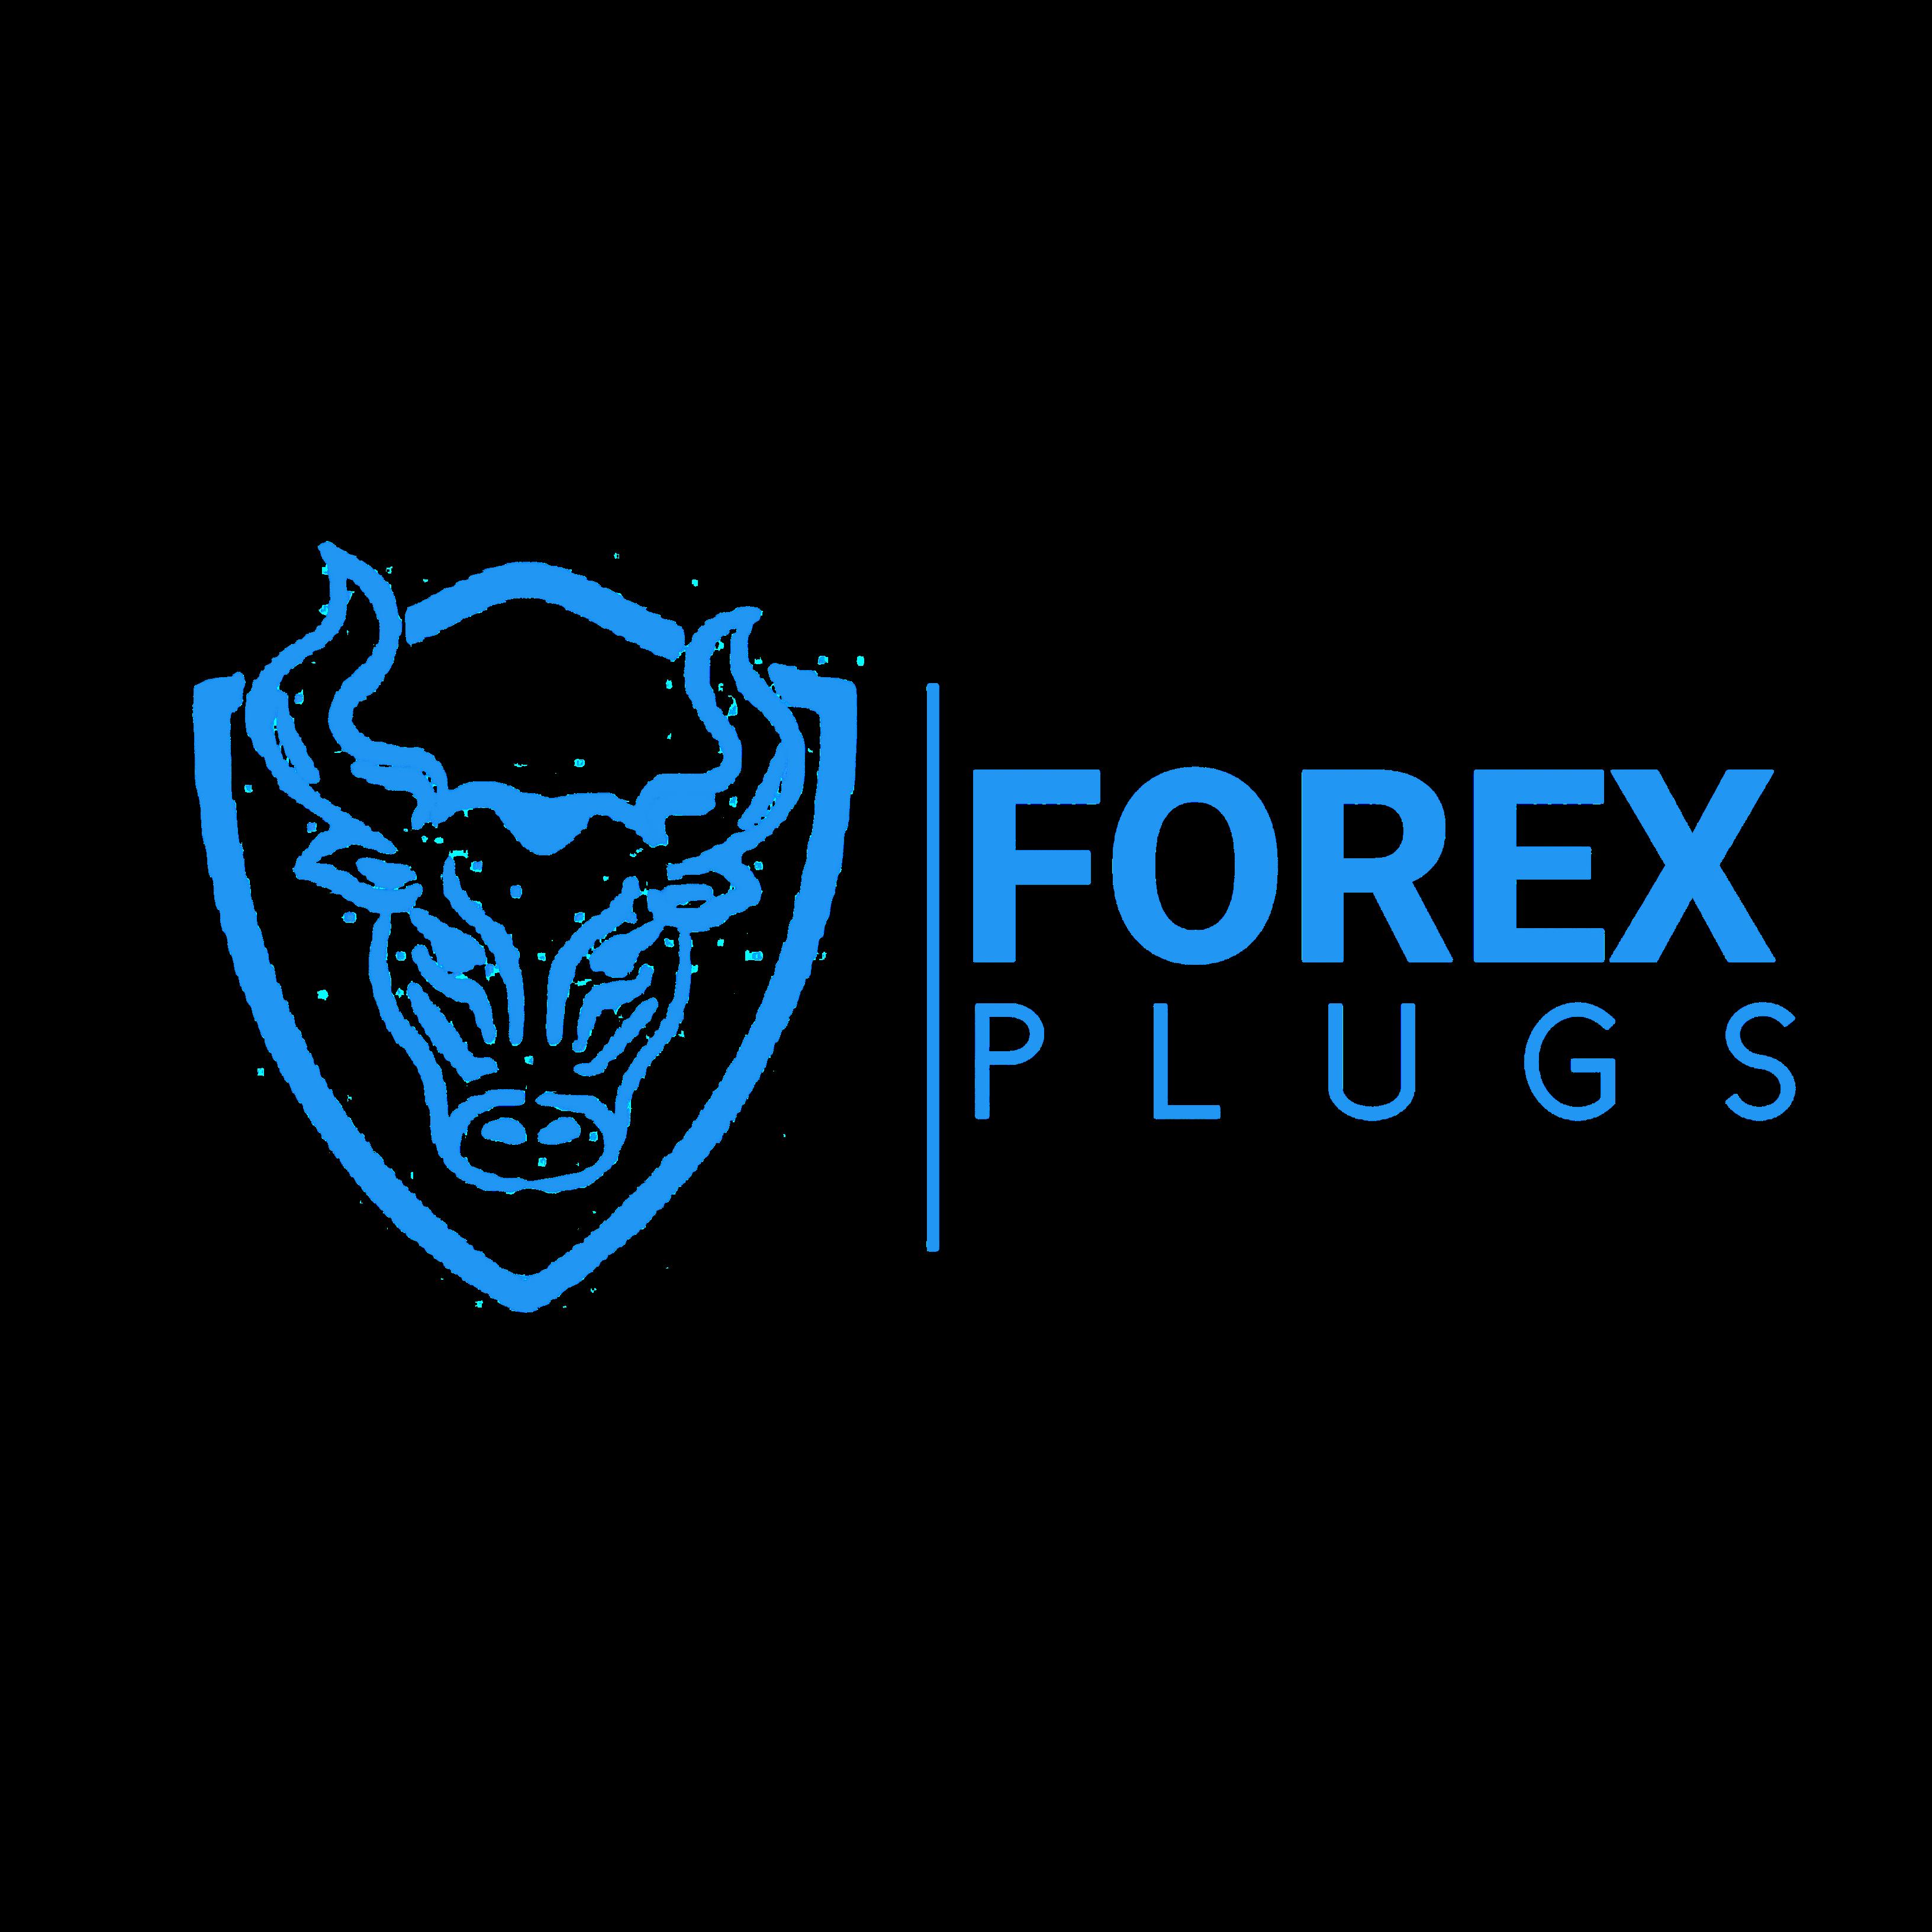 Forex Plugs Masterclass Full Membership 3 MONTHS subscription